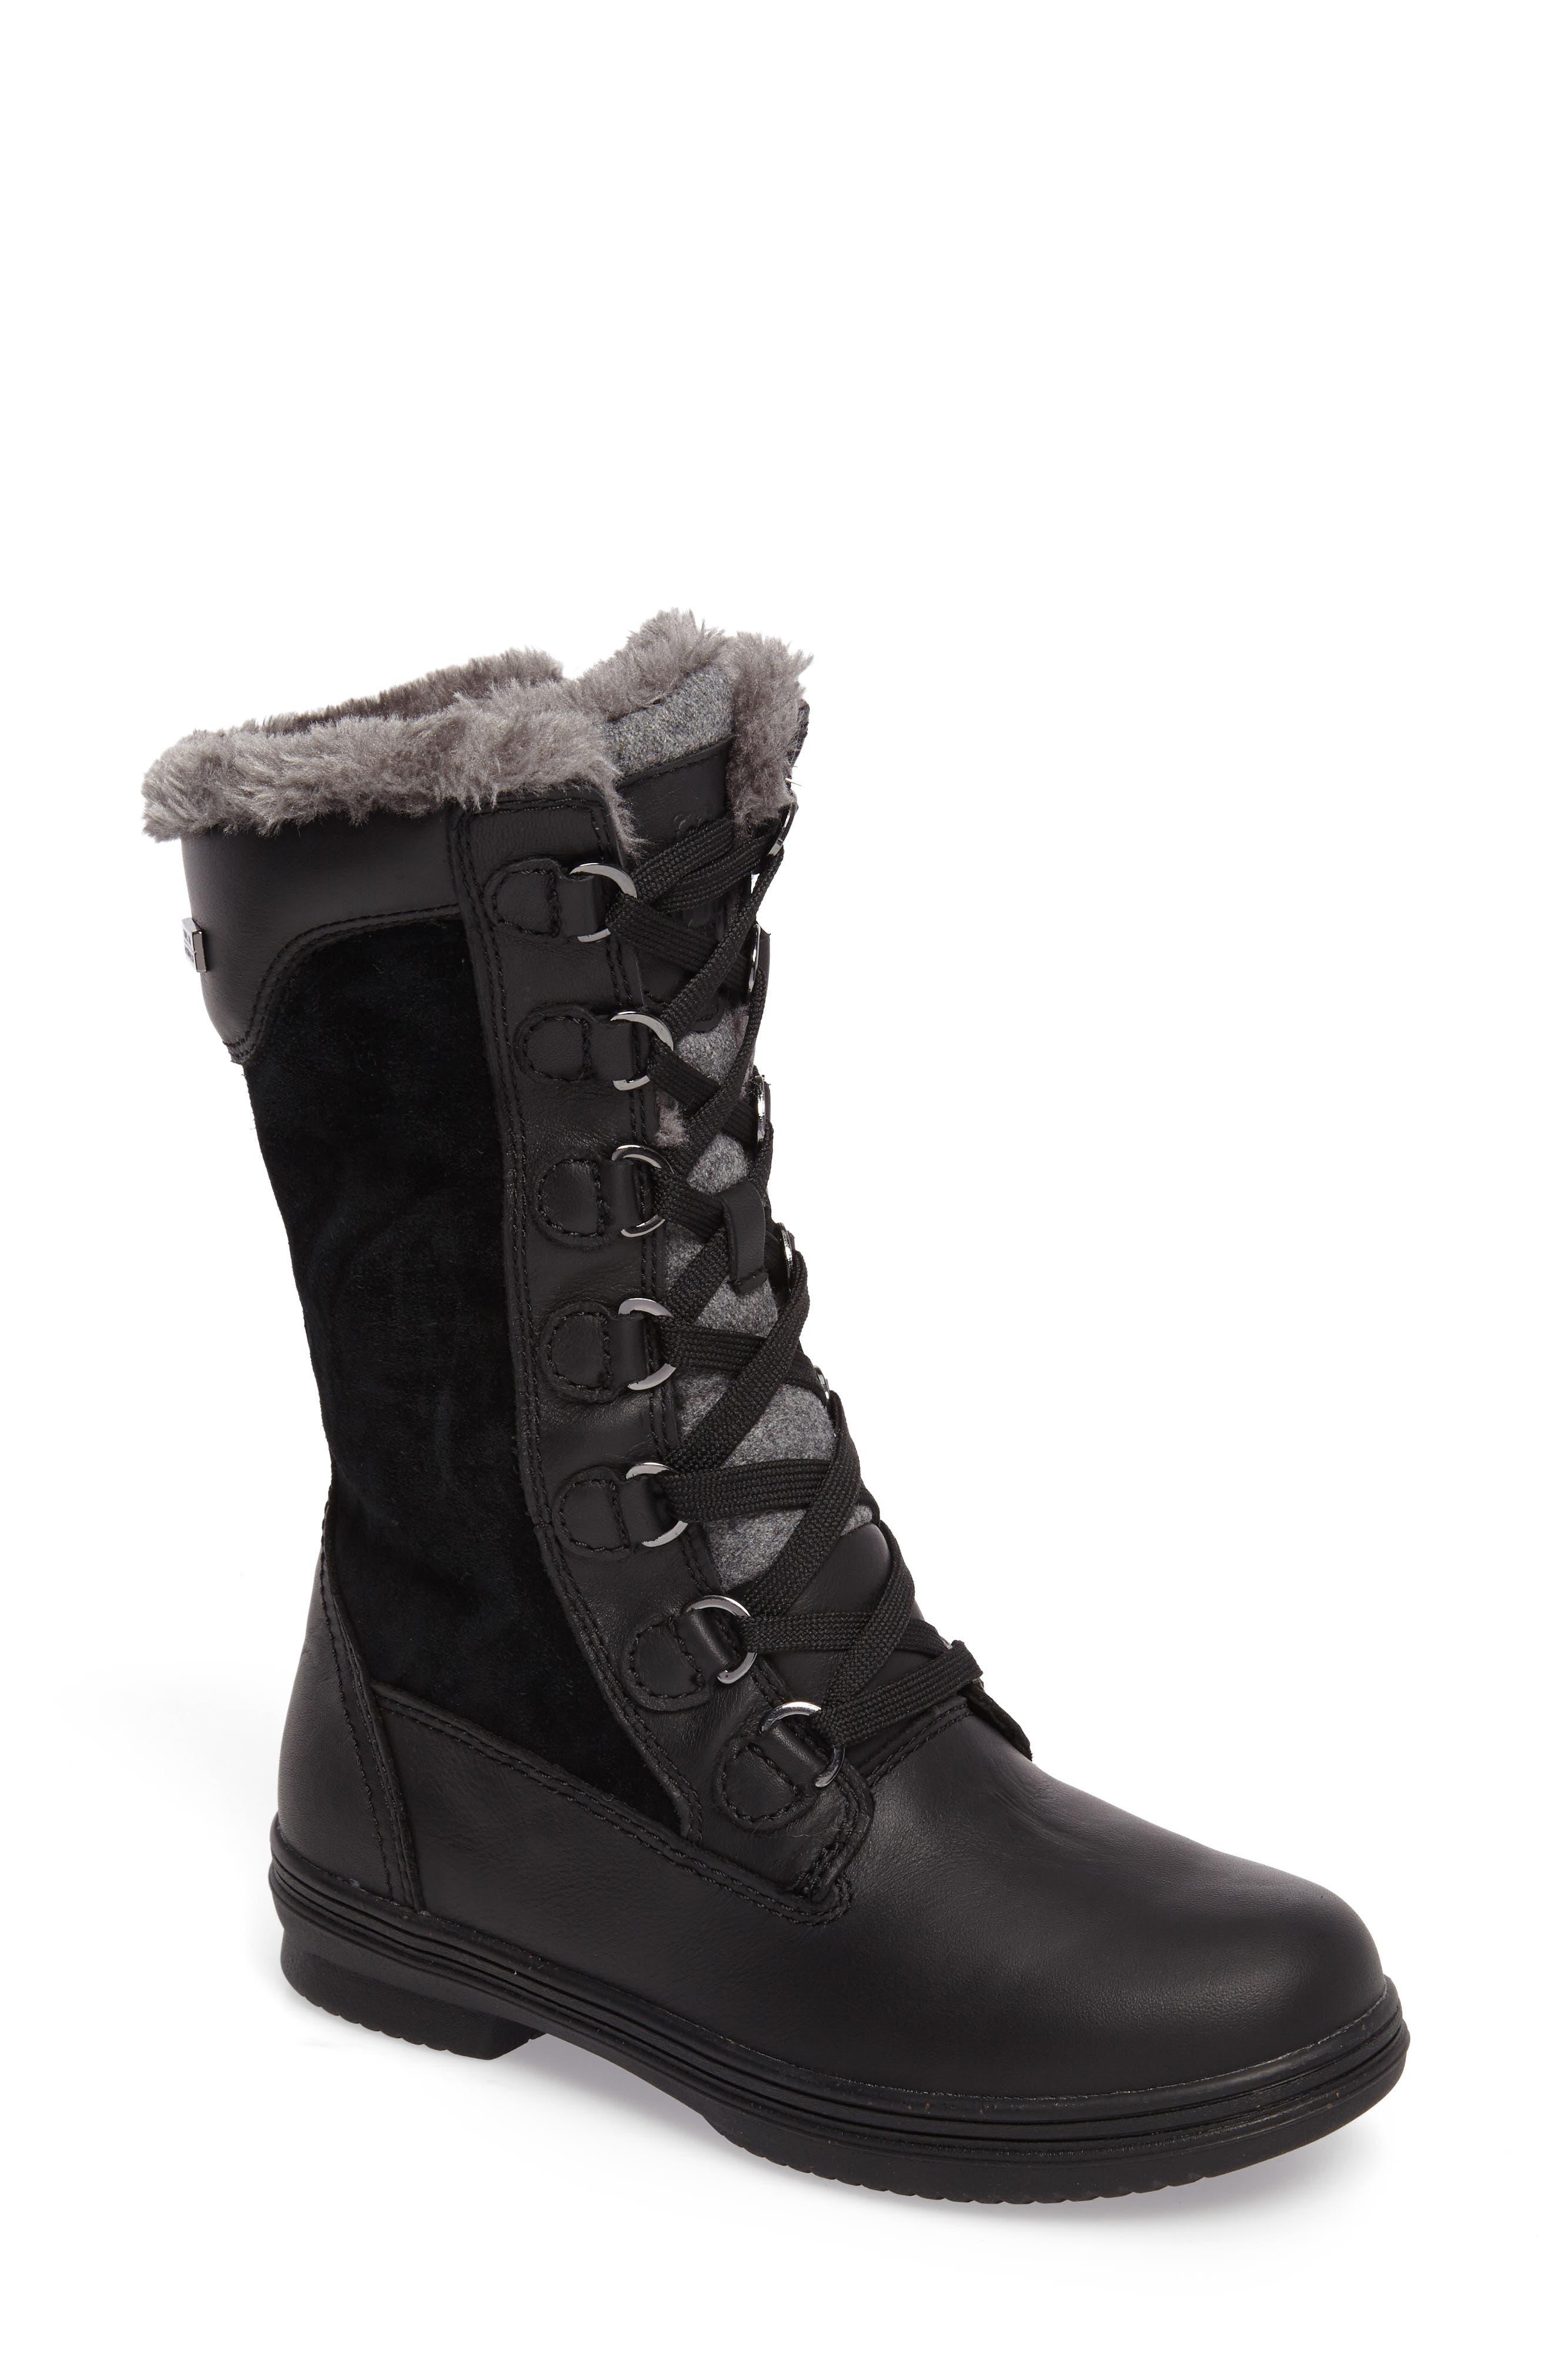 Glata Waterproof Boot,                         Main,                         color, 001